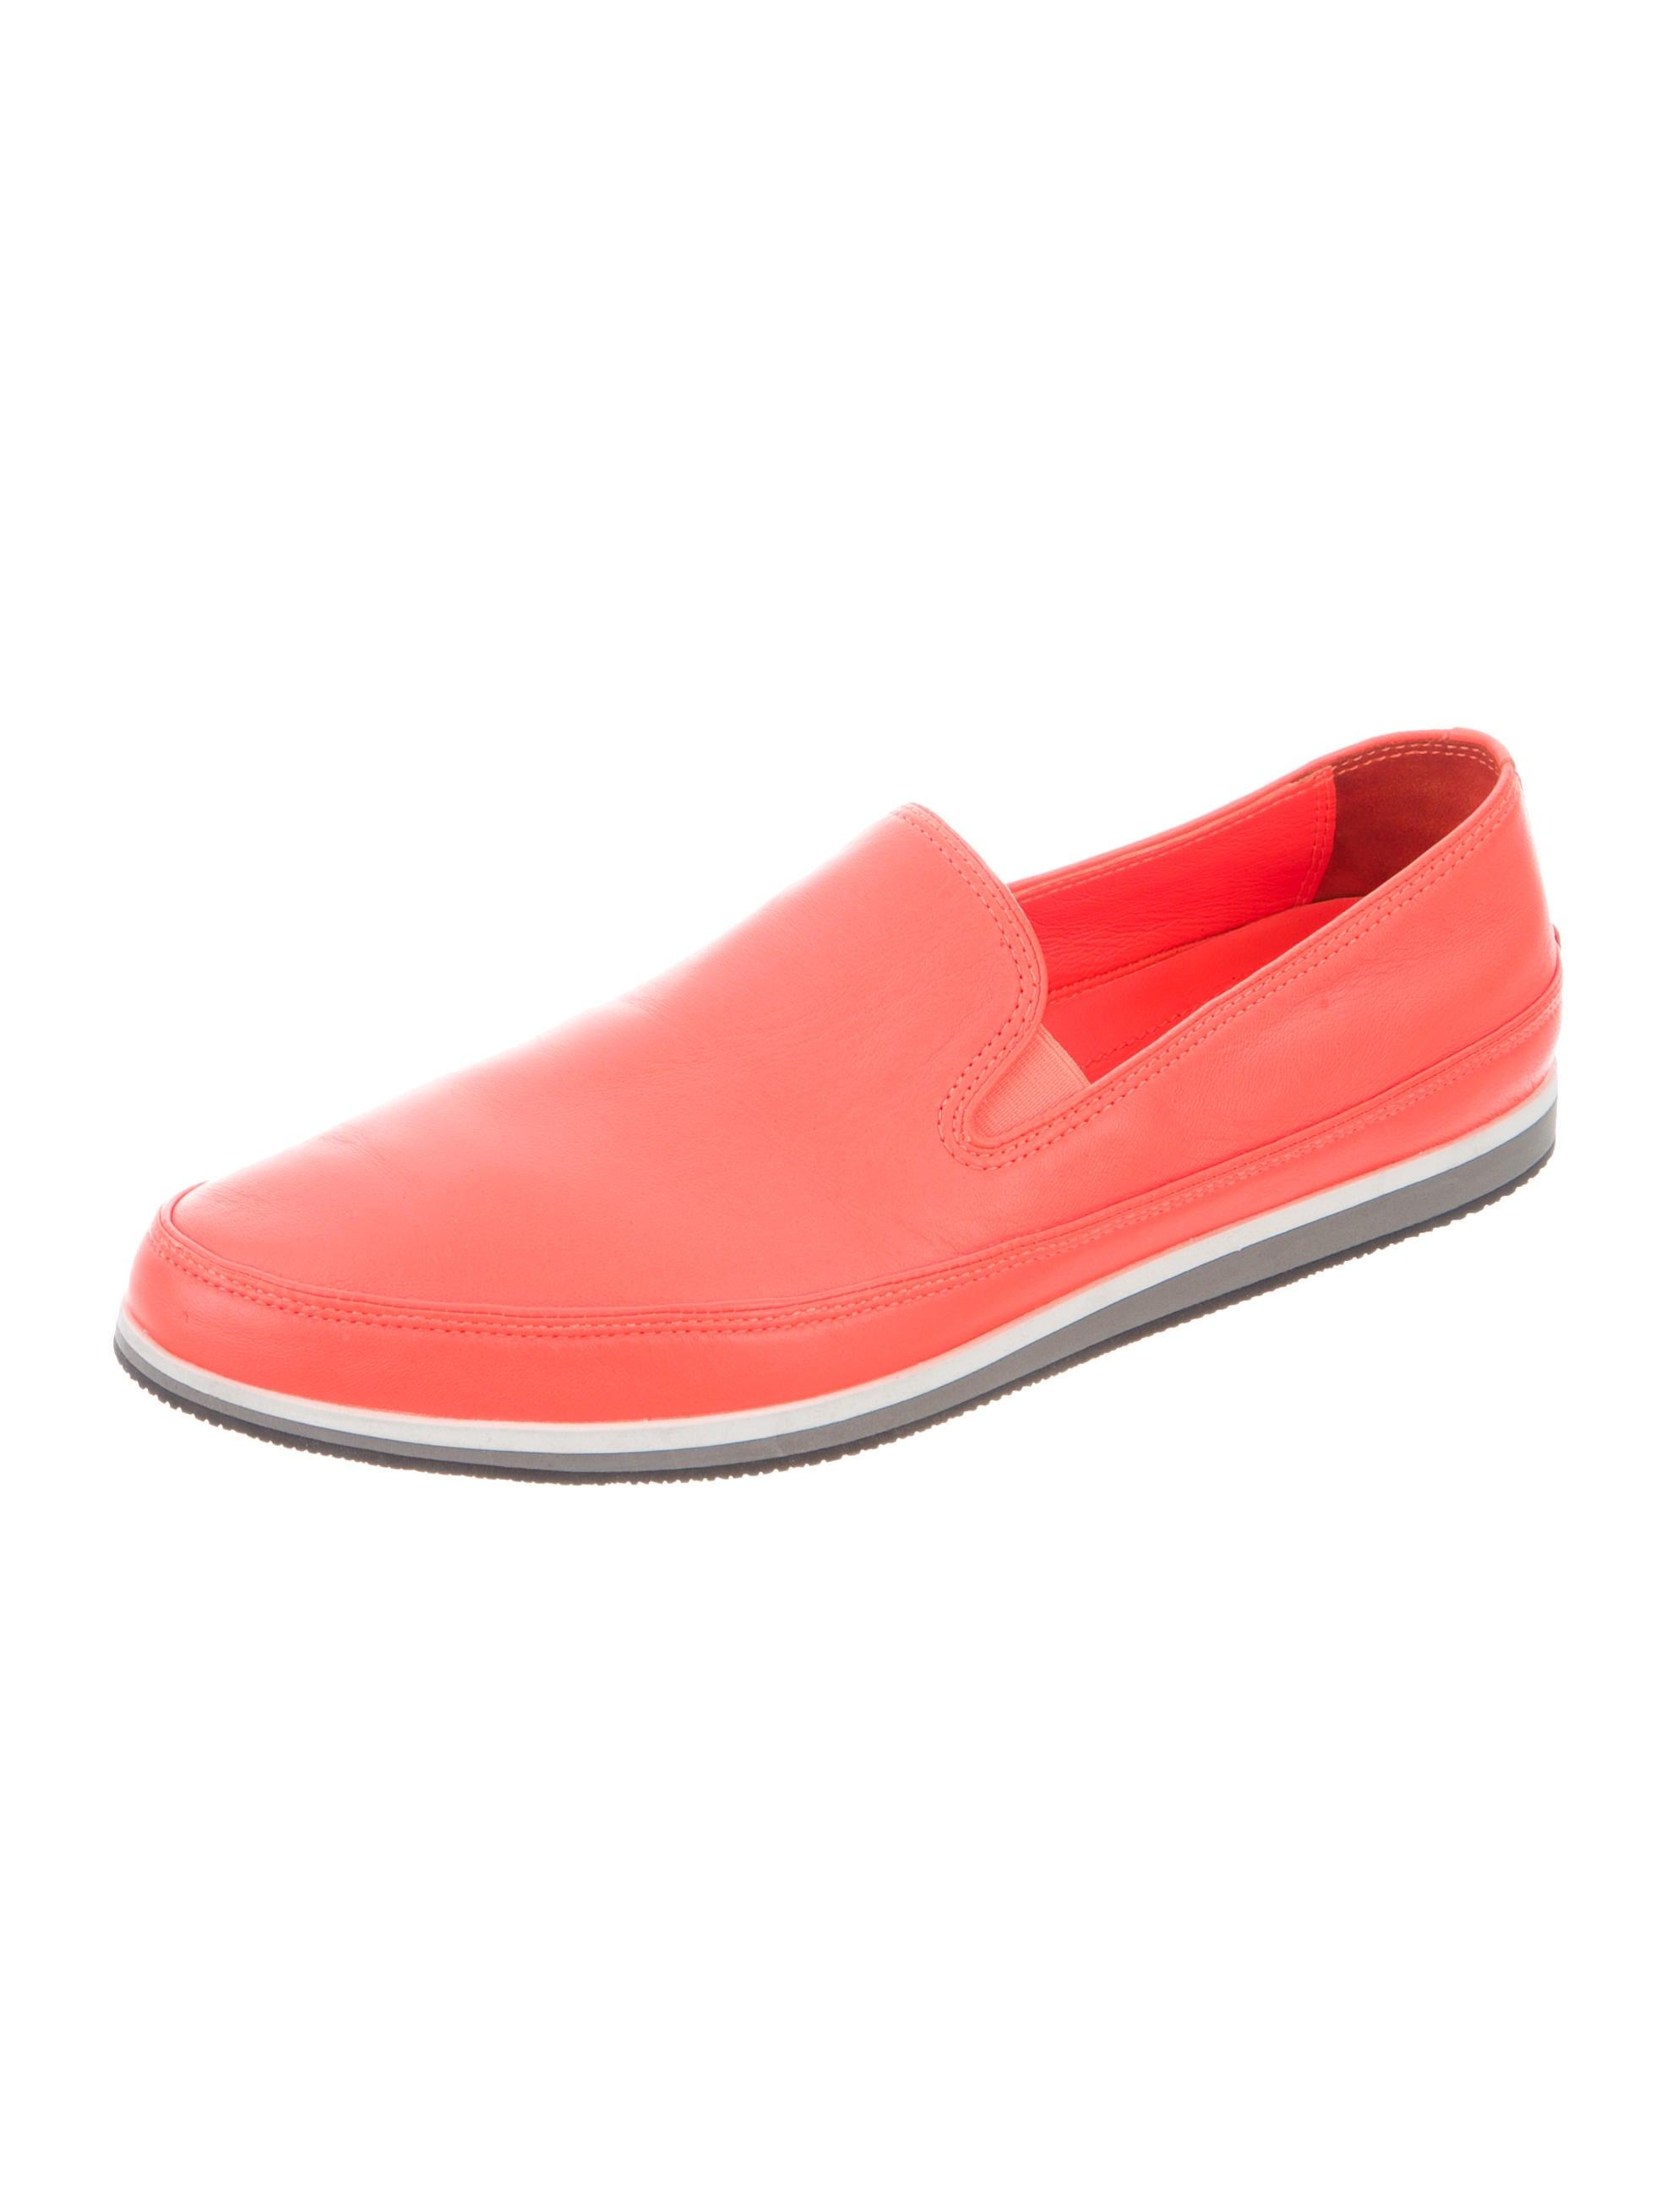 prada sport leather slip on sneakers shoes wpr40107